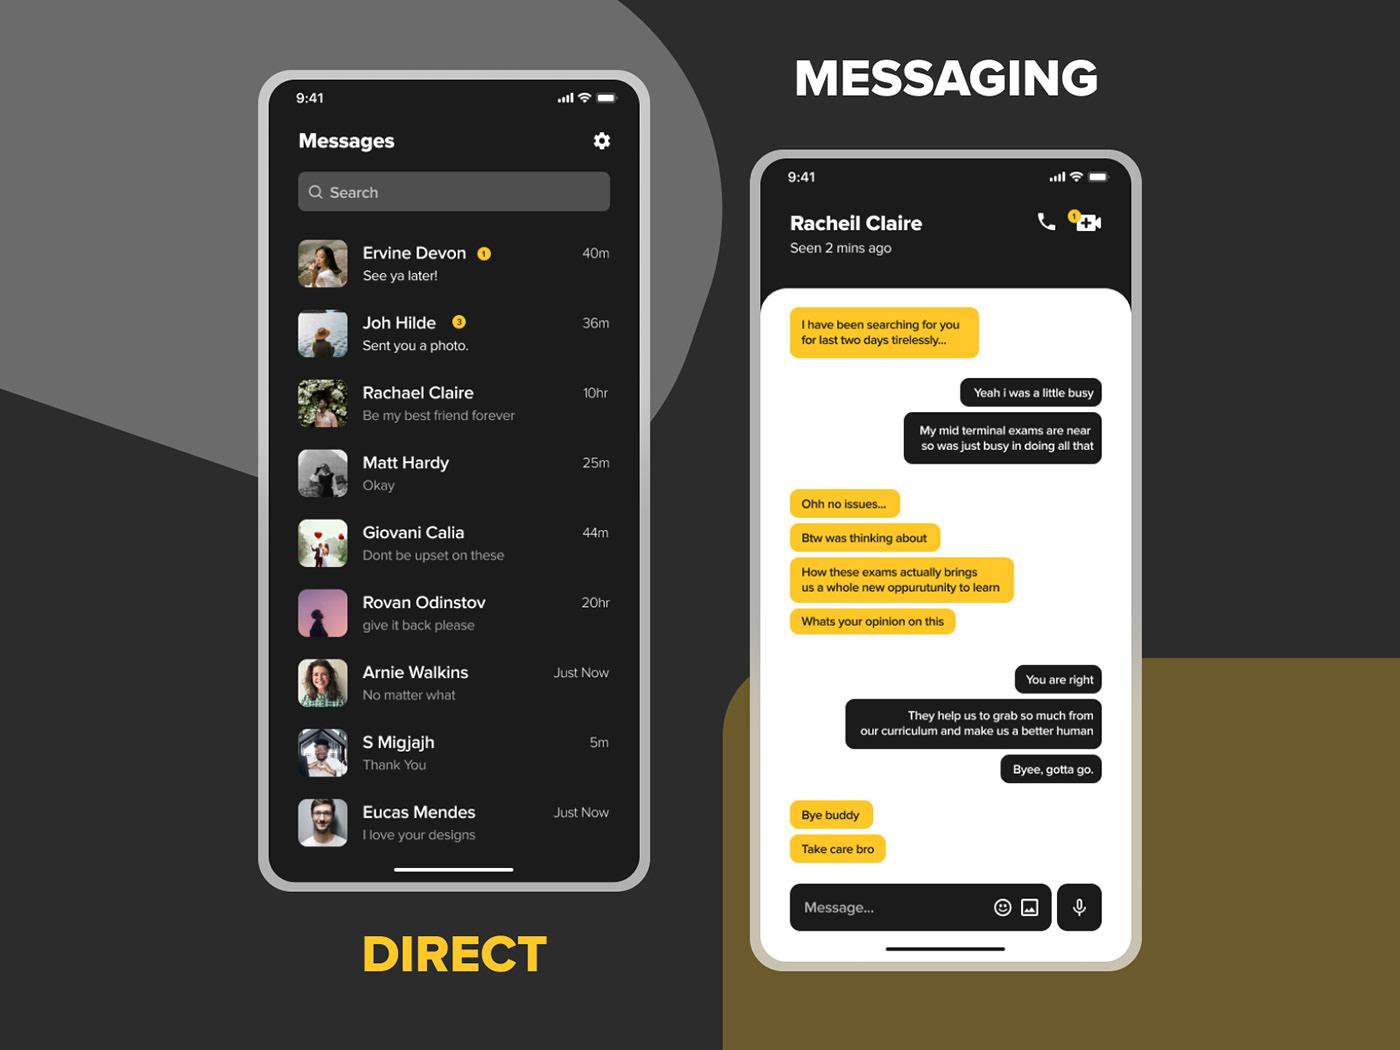 app ui chat app Design Inspiration Direct Messaging dribbble ui  Interaction design  Mobile UI UI UI ideas UI inspiration